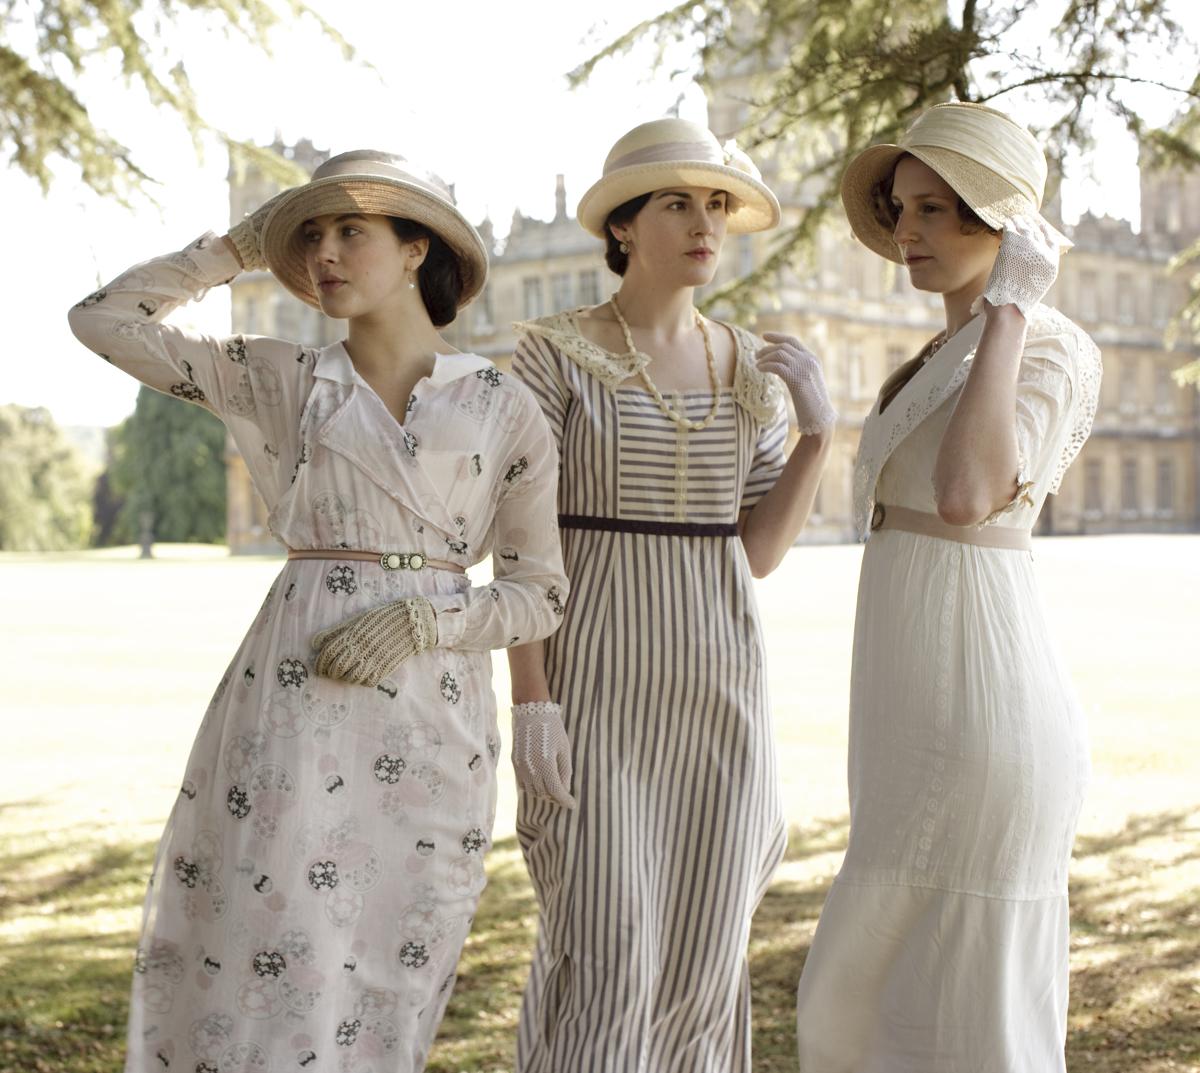 Edwardian-era dress